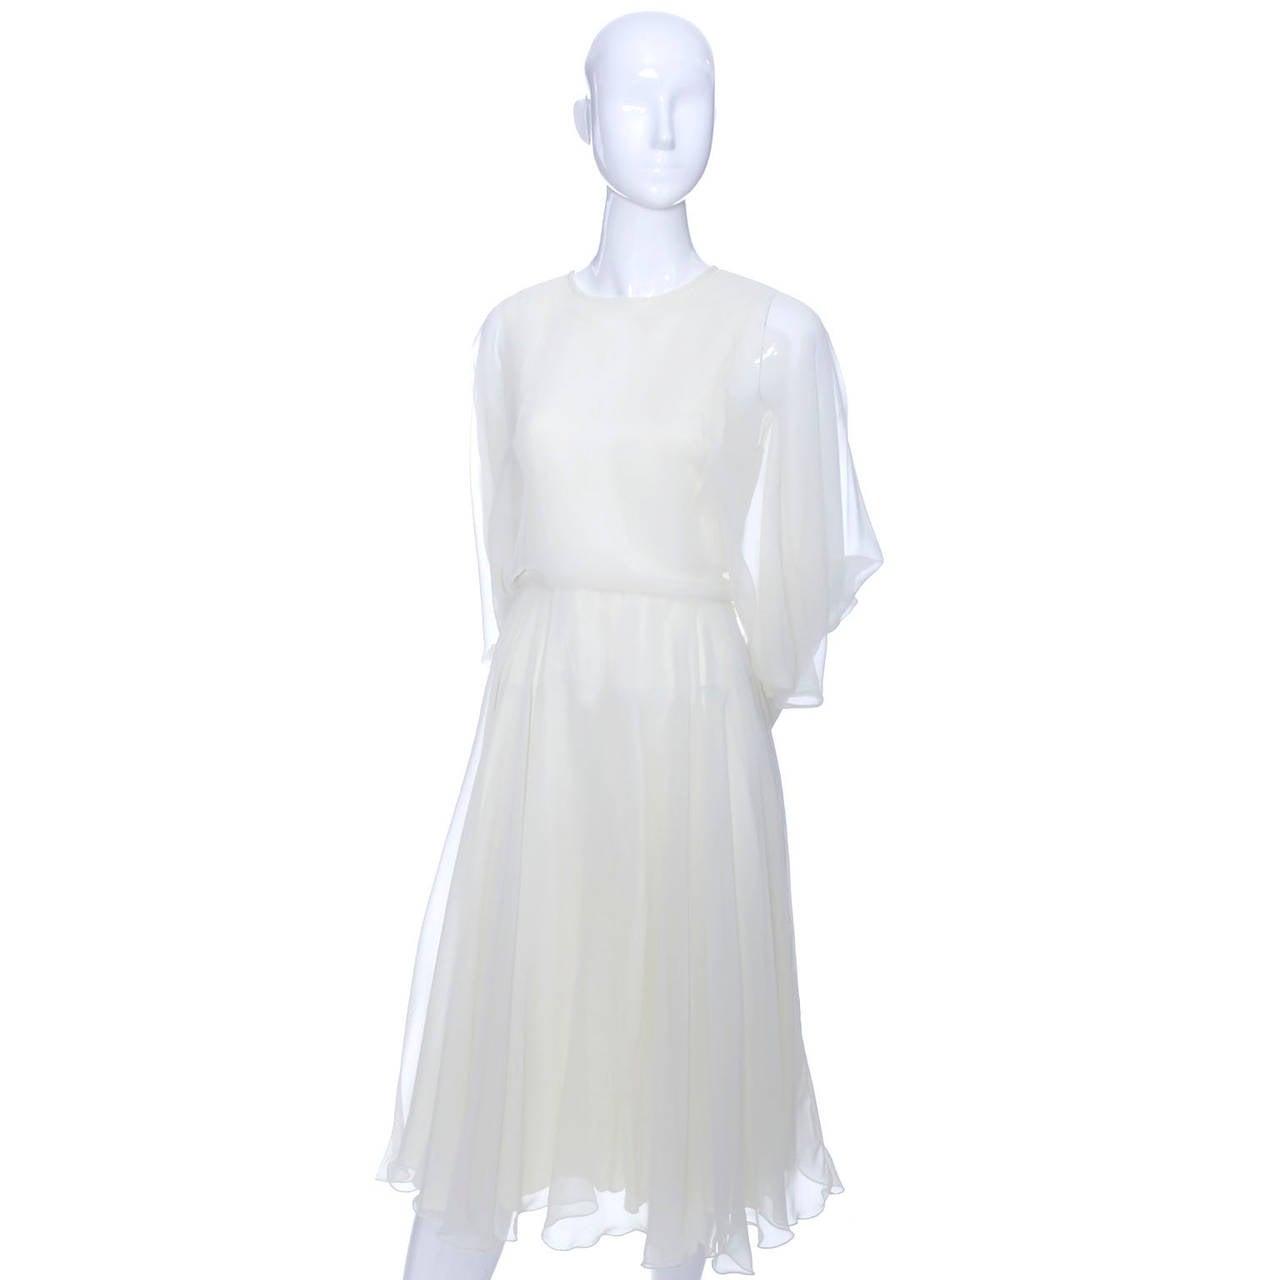 1970s Vintage Jean Varon John Bates Chiffon Designer Dress Batwing Sleeves For Sale 2